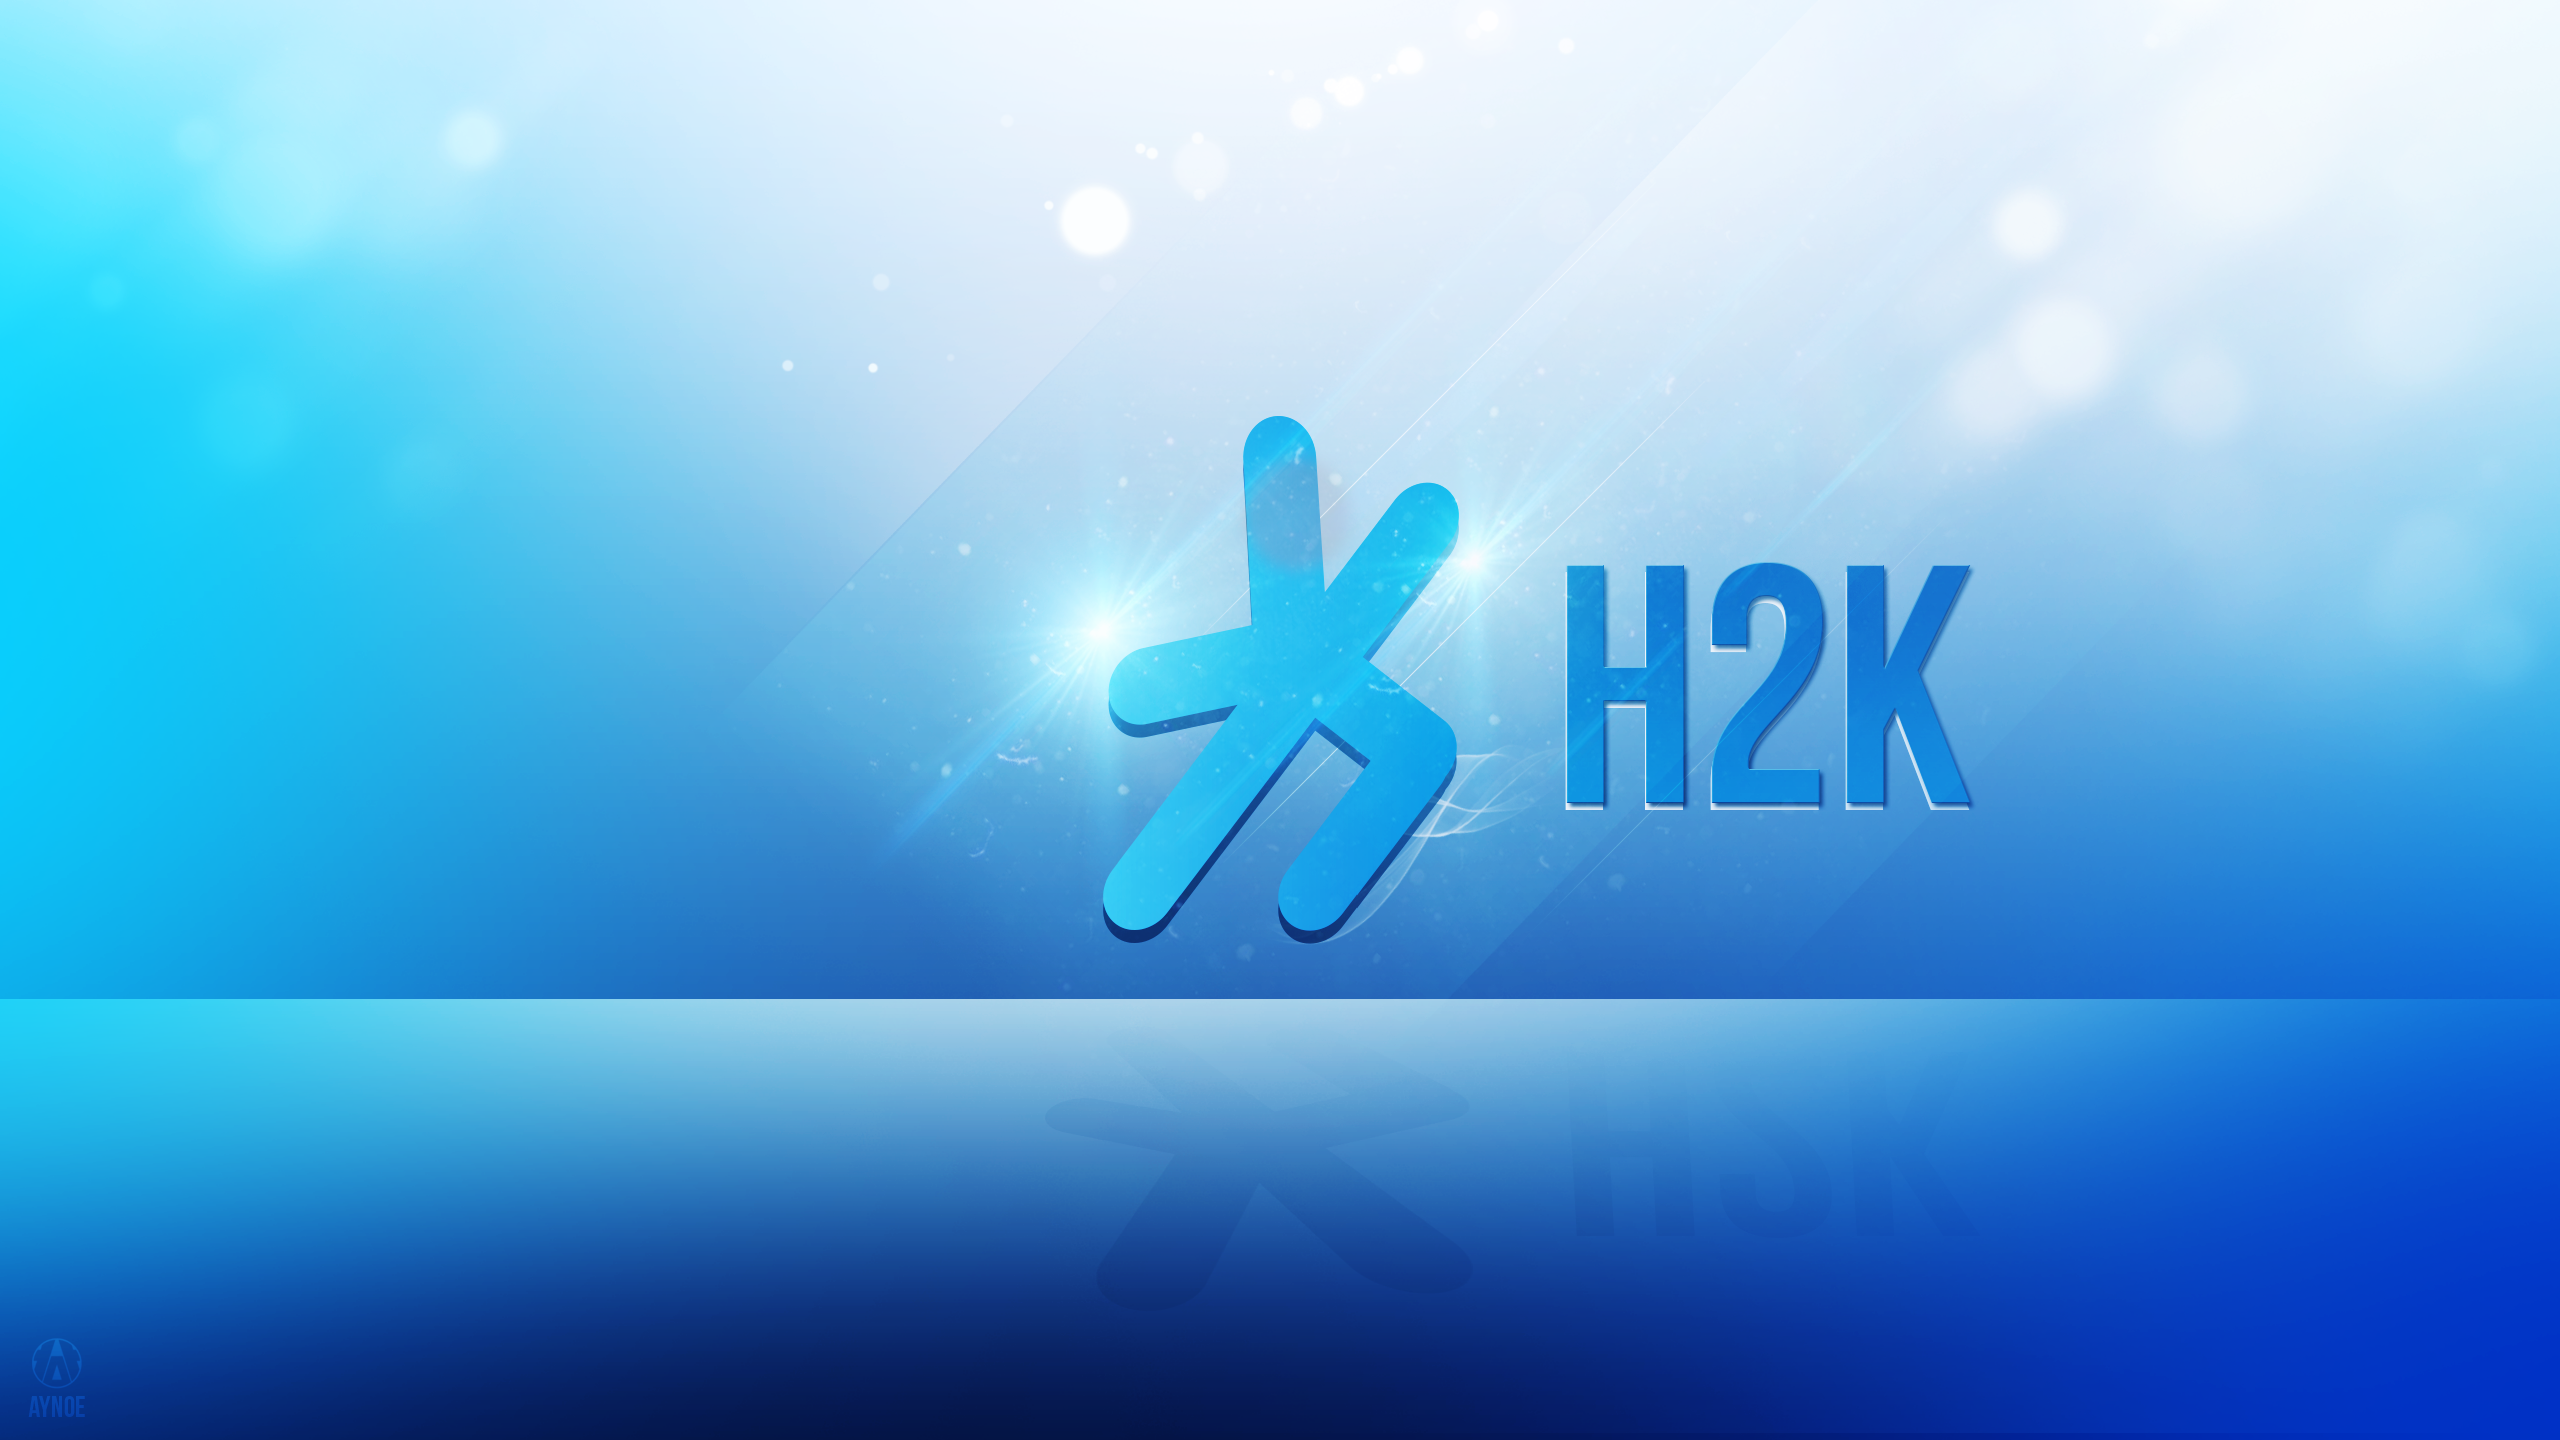 H2K wallpaper